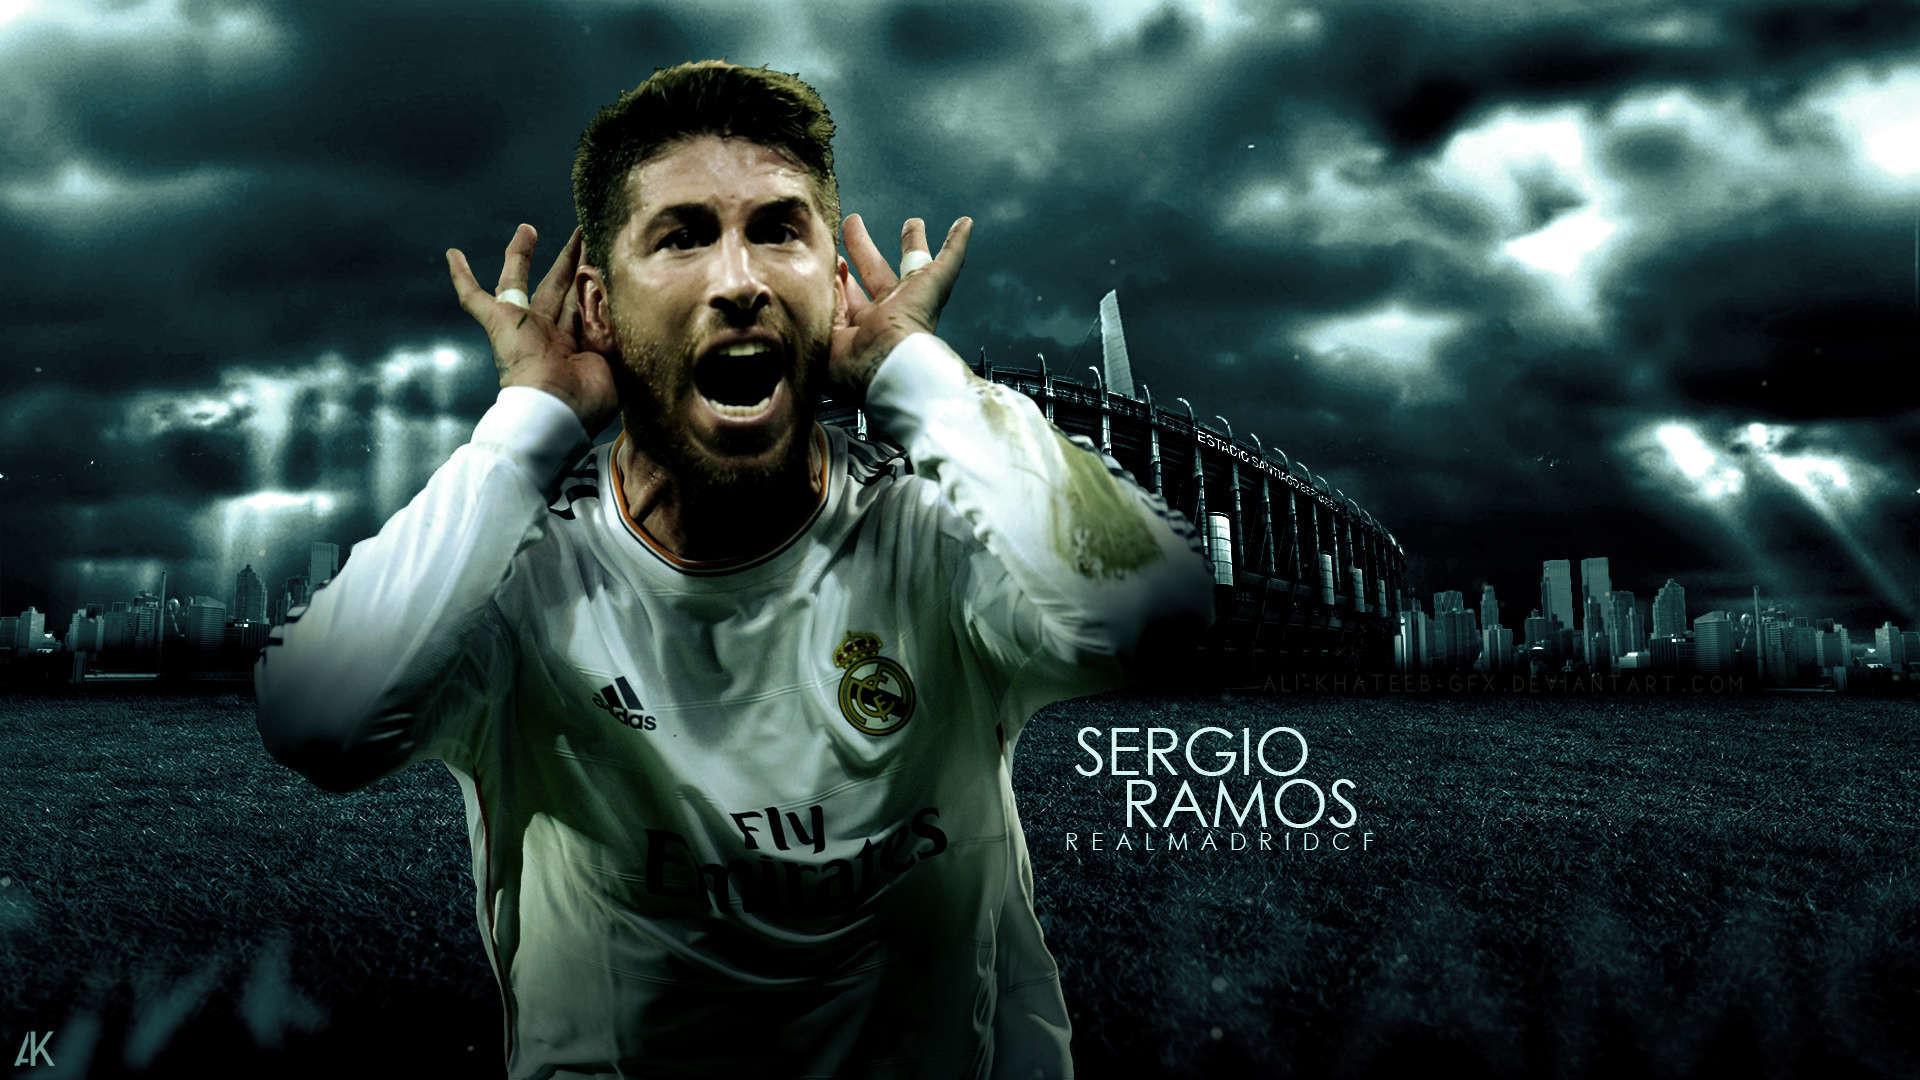 Sergio Ramos 2018 Wallpaper (83+ Pictures